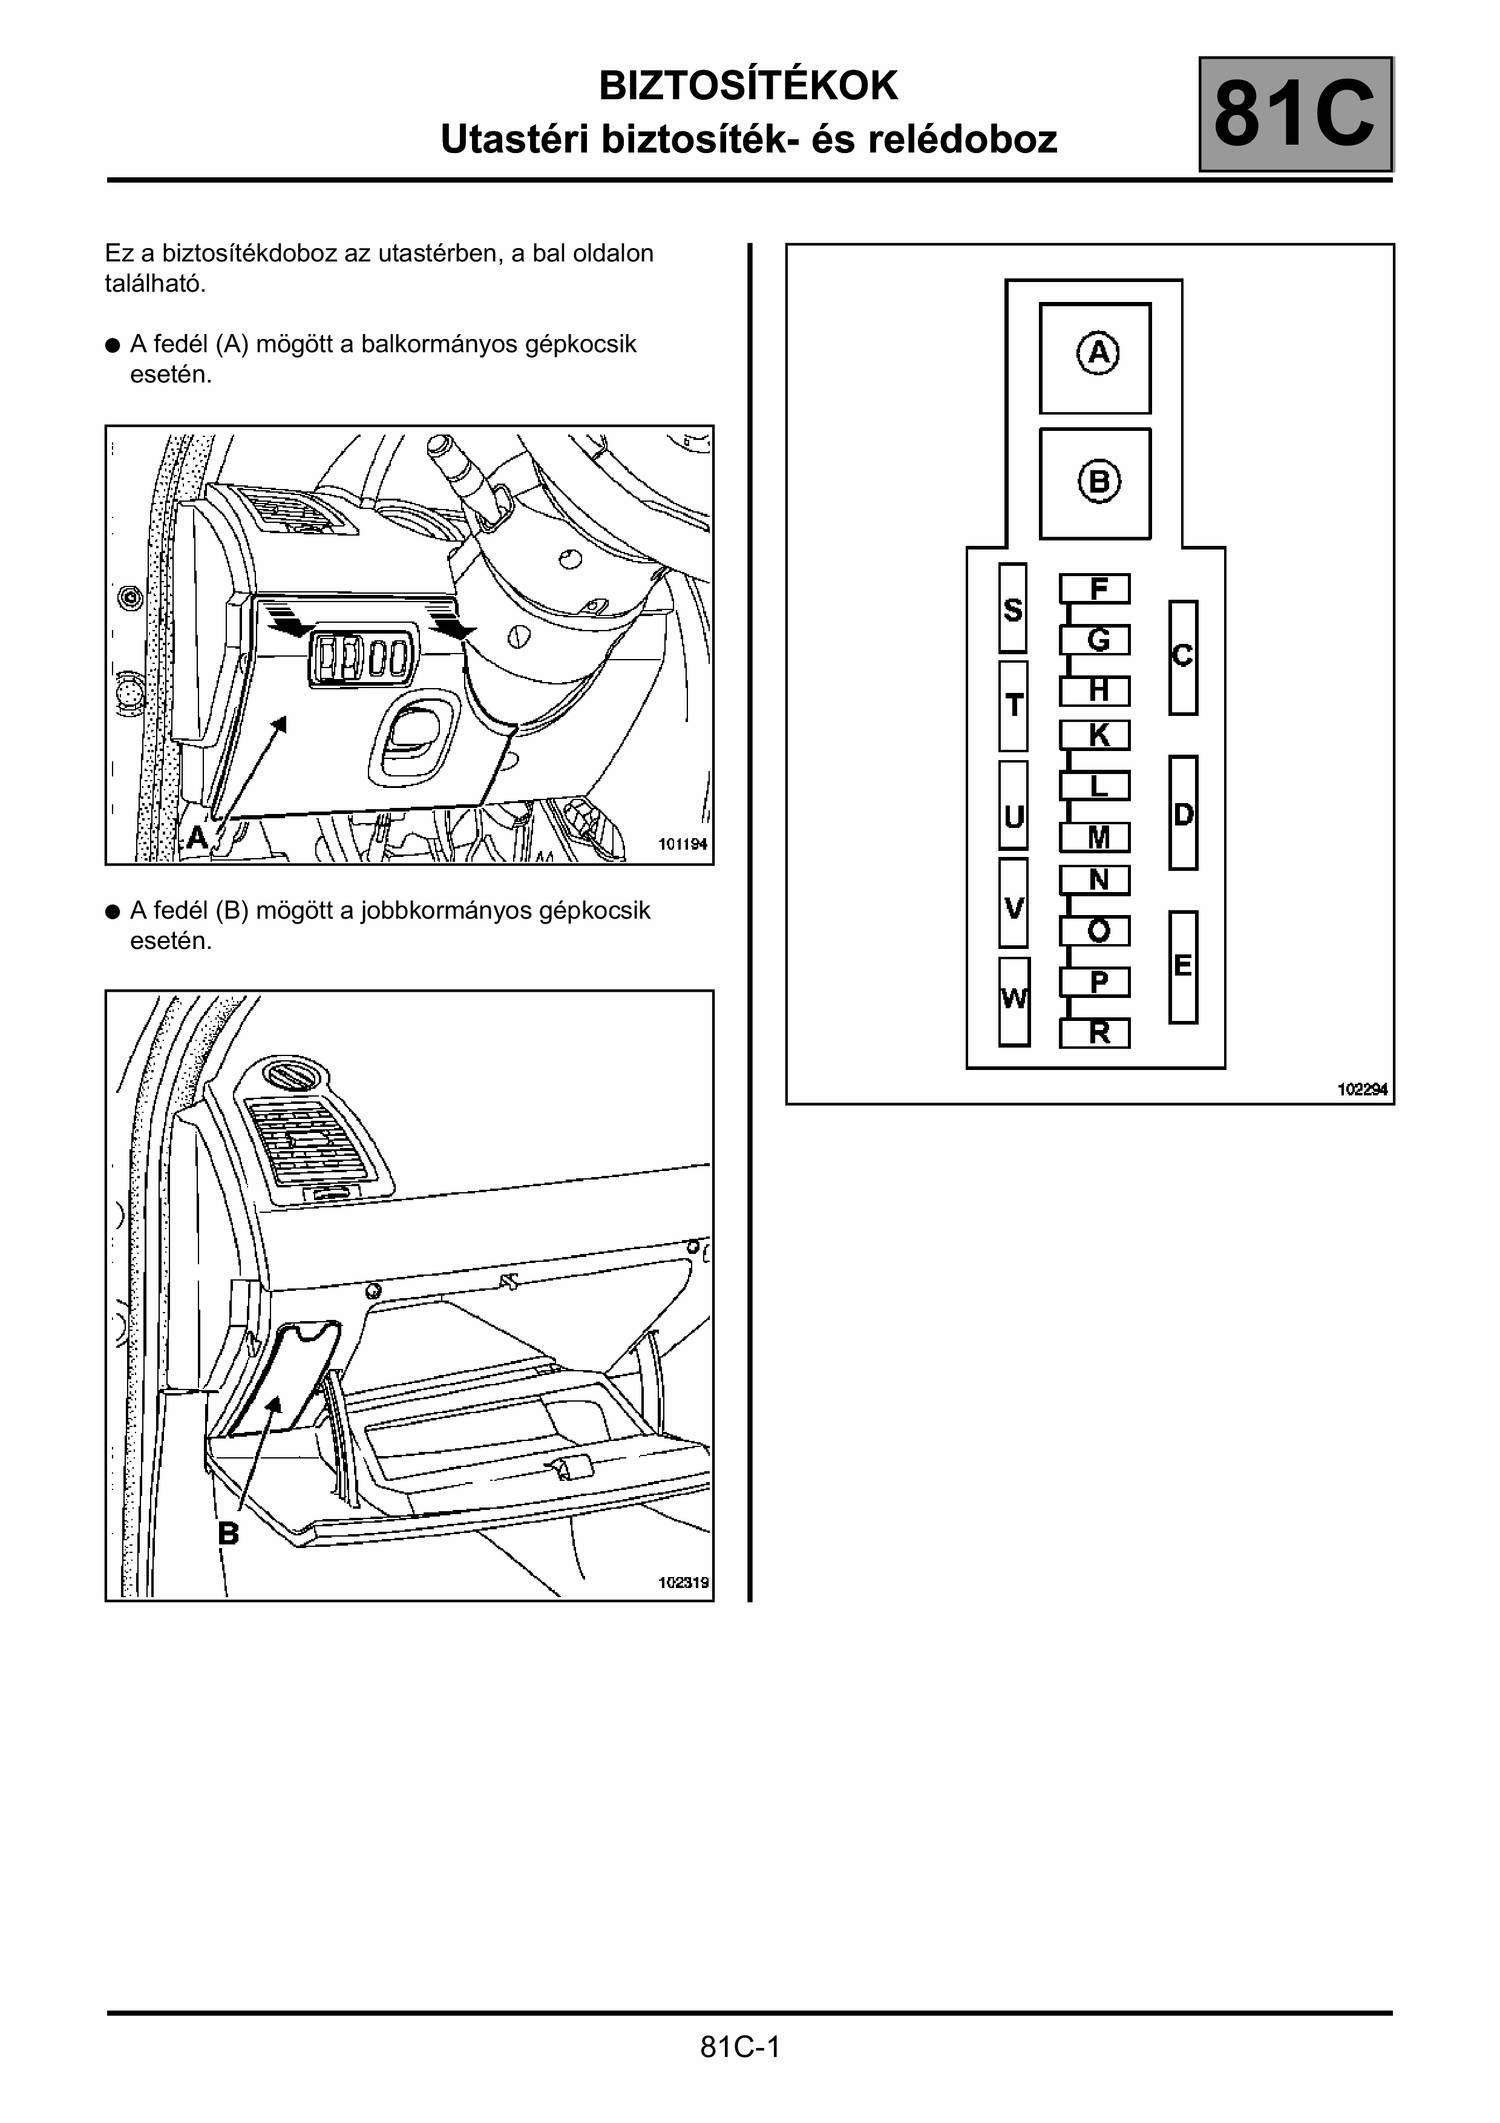 renault megane 2 biztos u00edt u00e9kok pdf